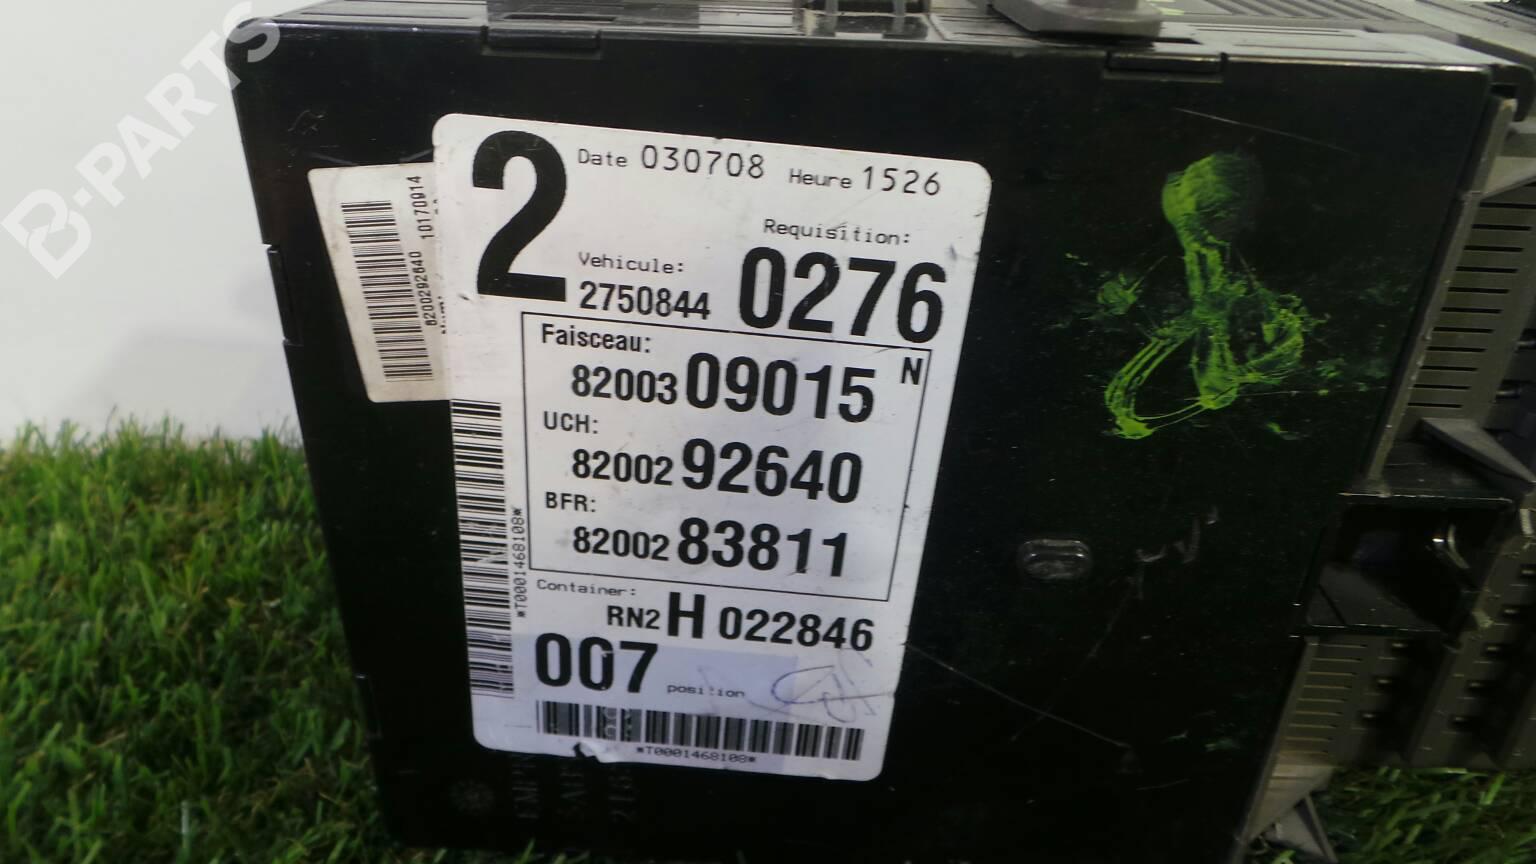 Fuse Box Renault Laguna Ii Bg0 1 19 Dci Bg08 Bg0g 1571526 Sign 8200 004 201 E